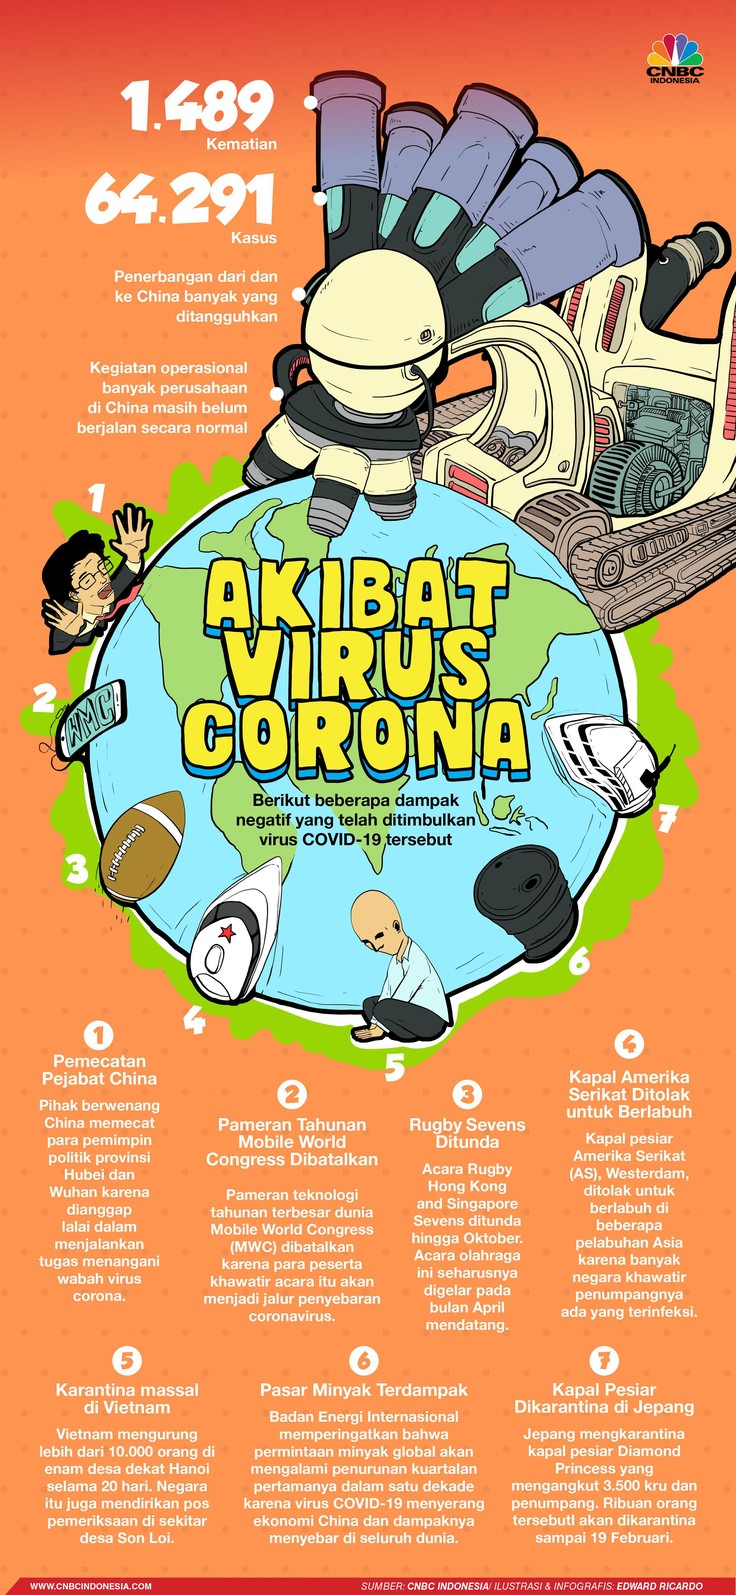 Fakta Mengejutkan Virus Corona Makan Korban Nyaris 1.500 Jiwa